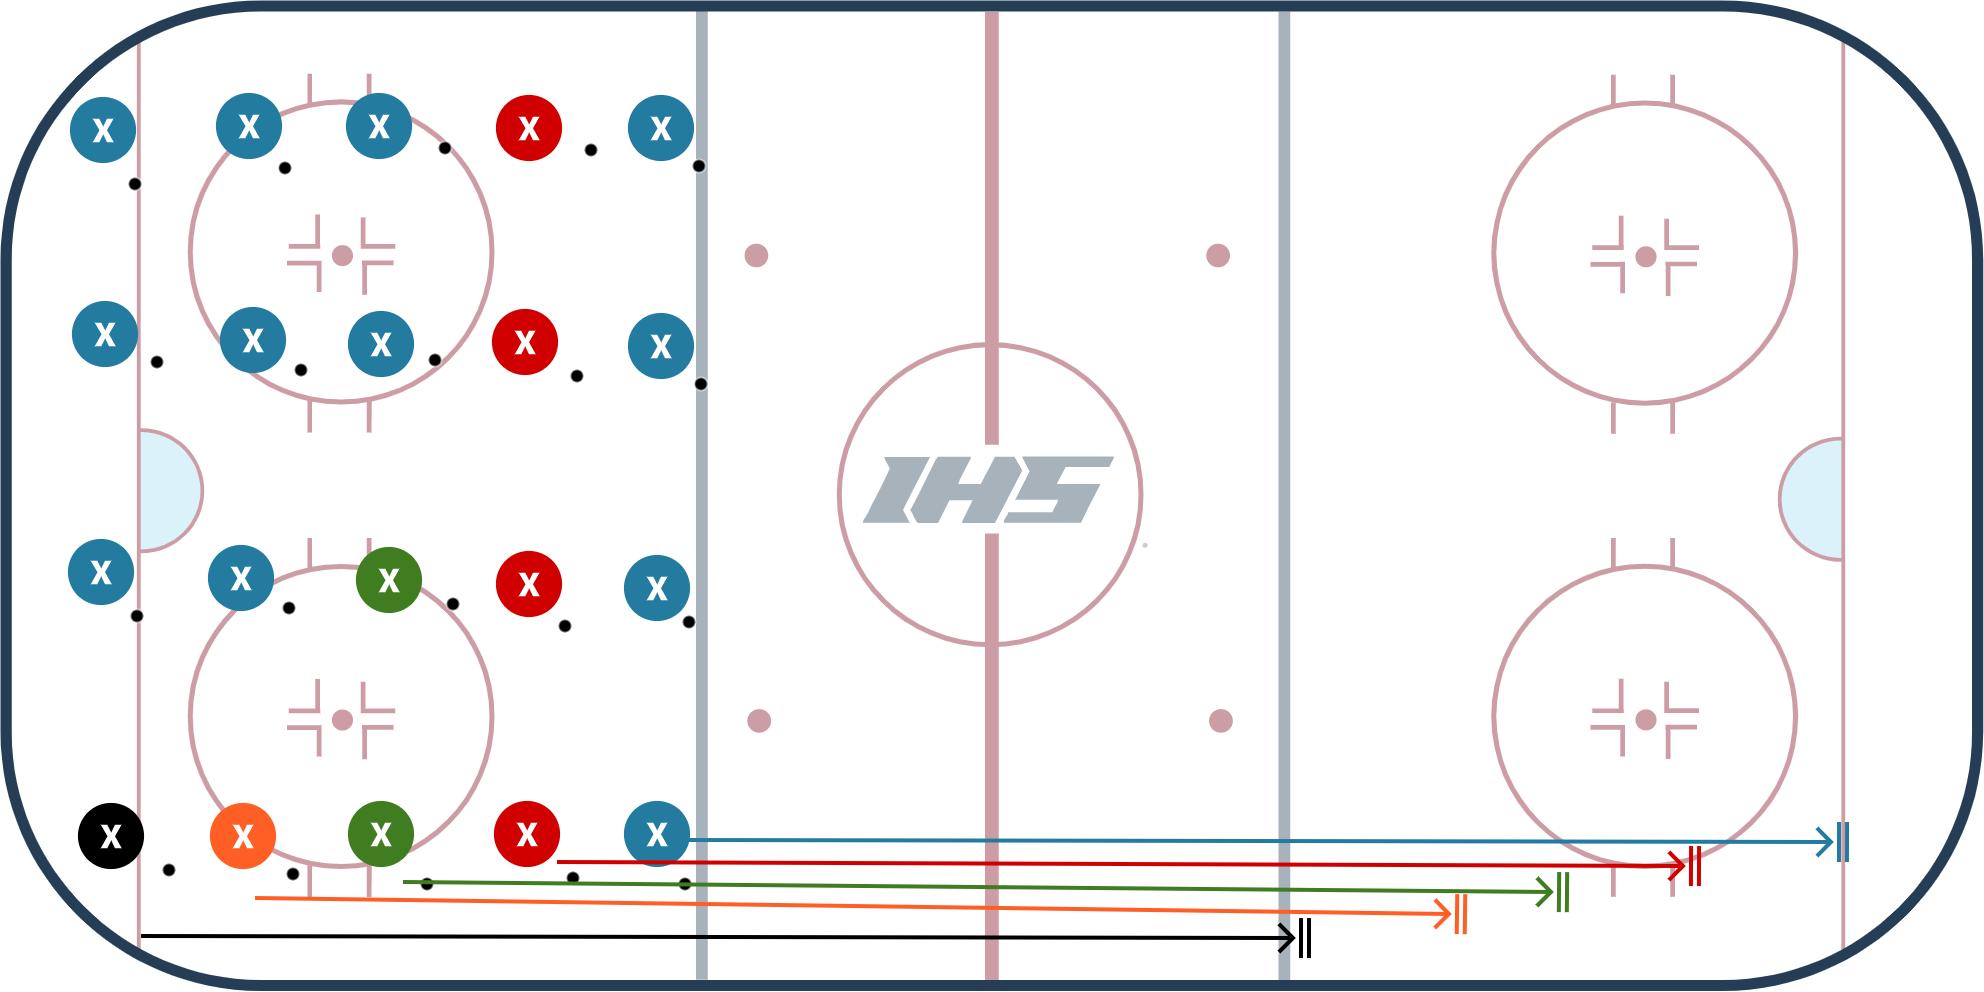 line skating and skills while maintaining social distancing